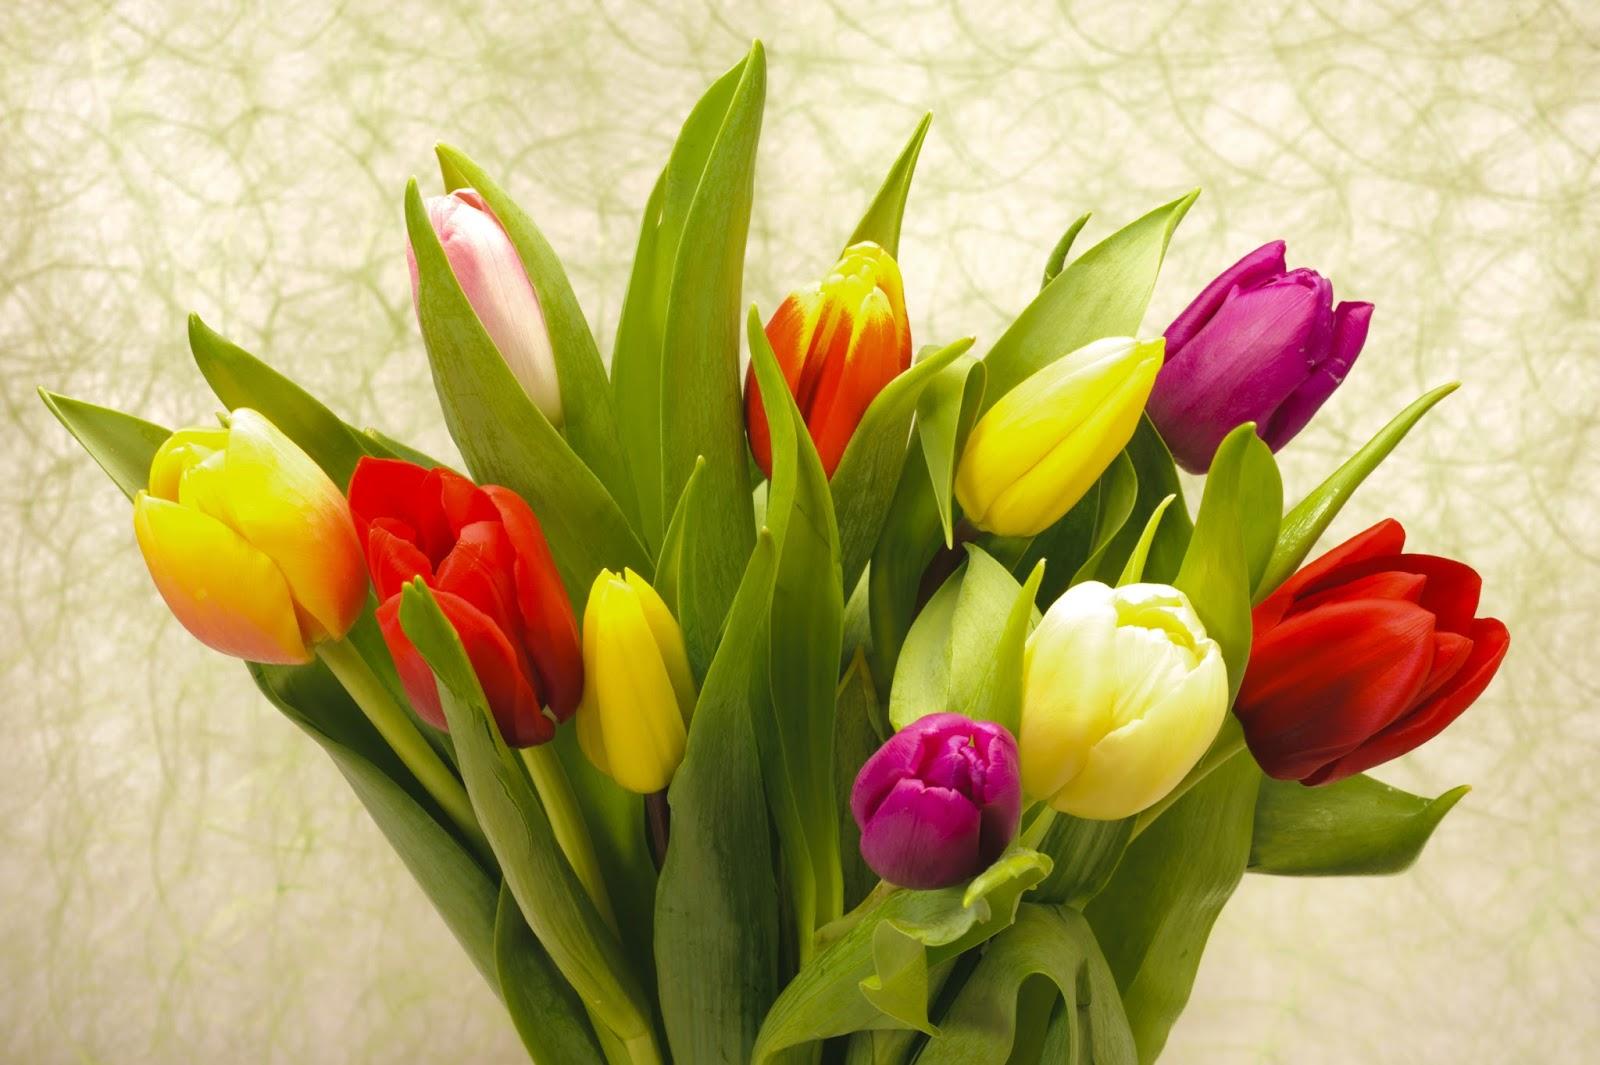 10 Fotos Gratis De Flores